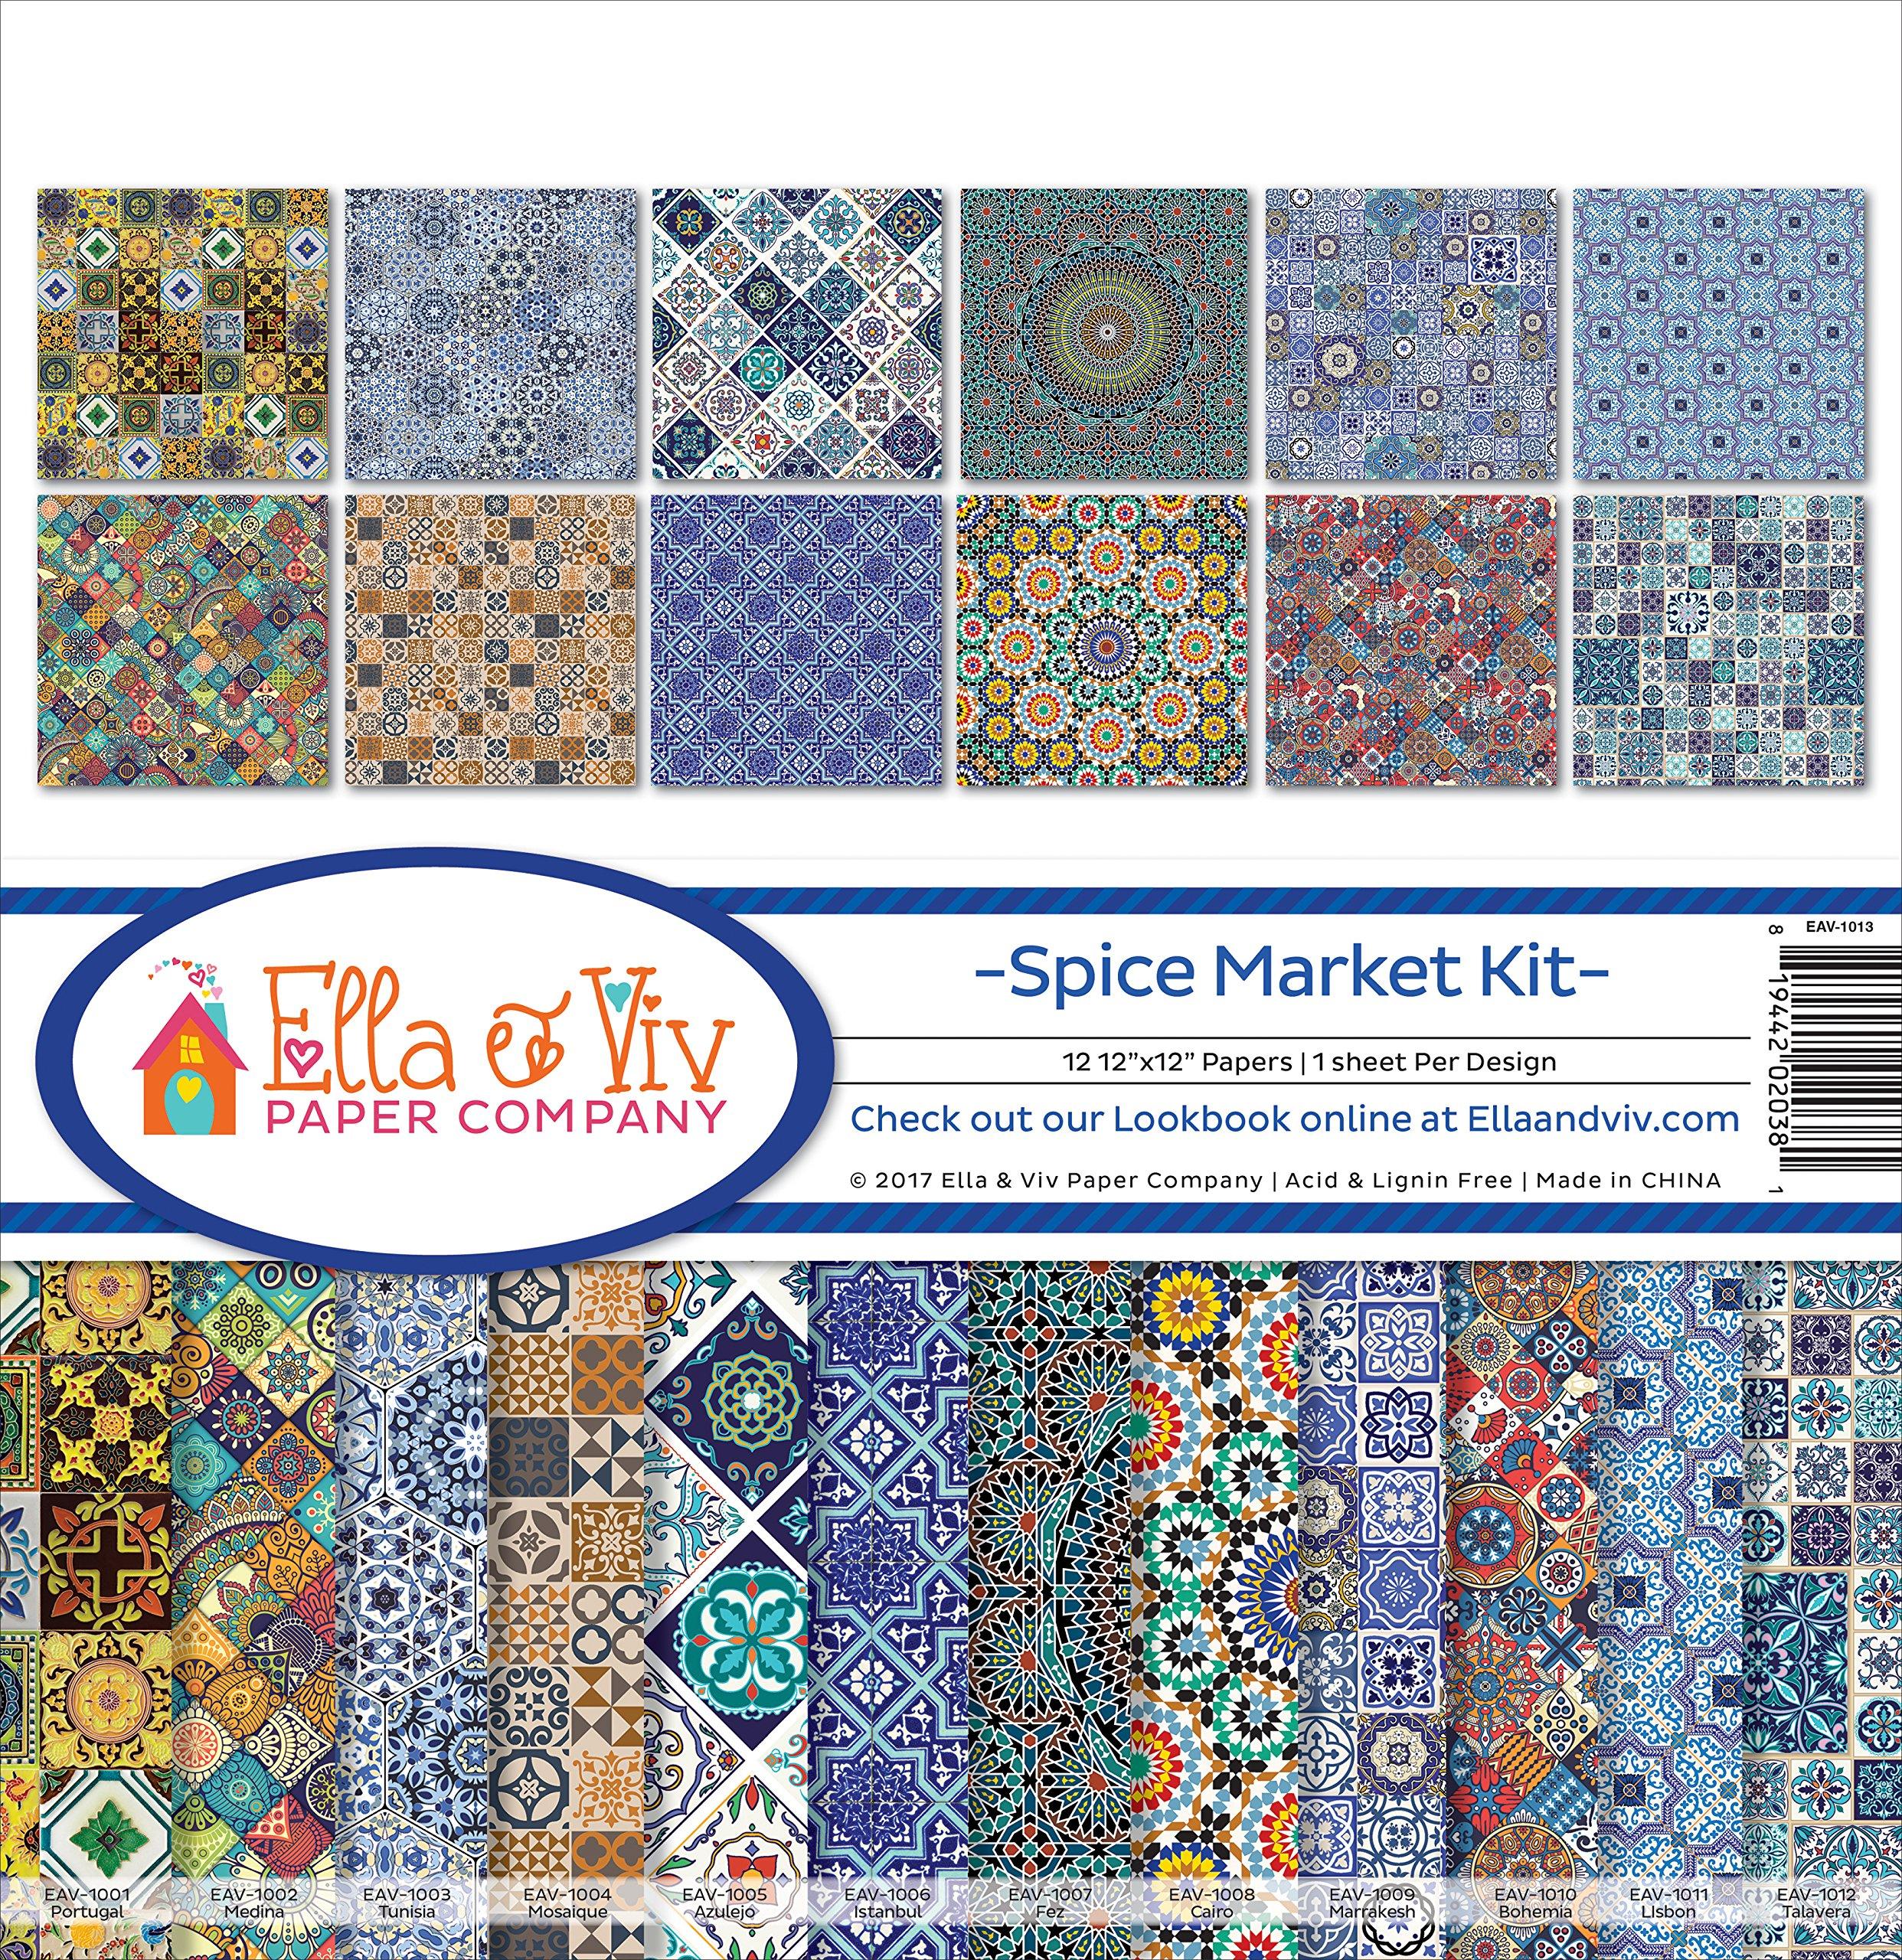 Ella & Viv by Reminisce Spice Market Scrapbook Collection Kit by Ella & Viv by Reminisce